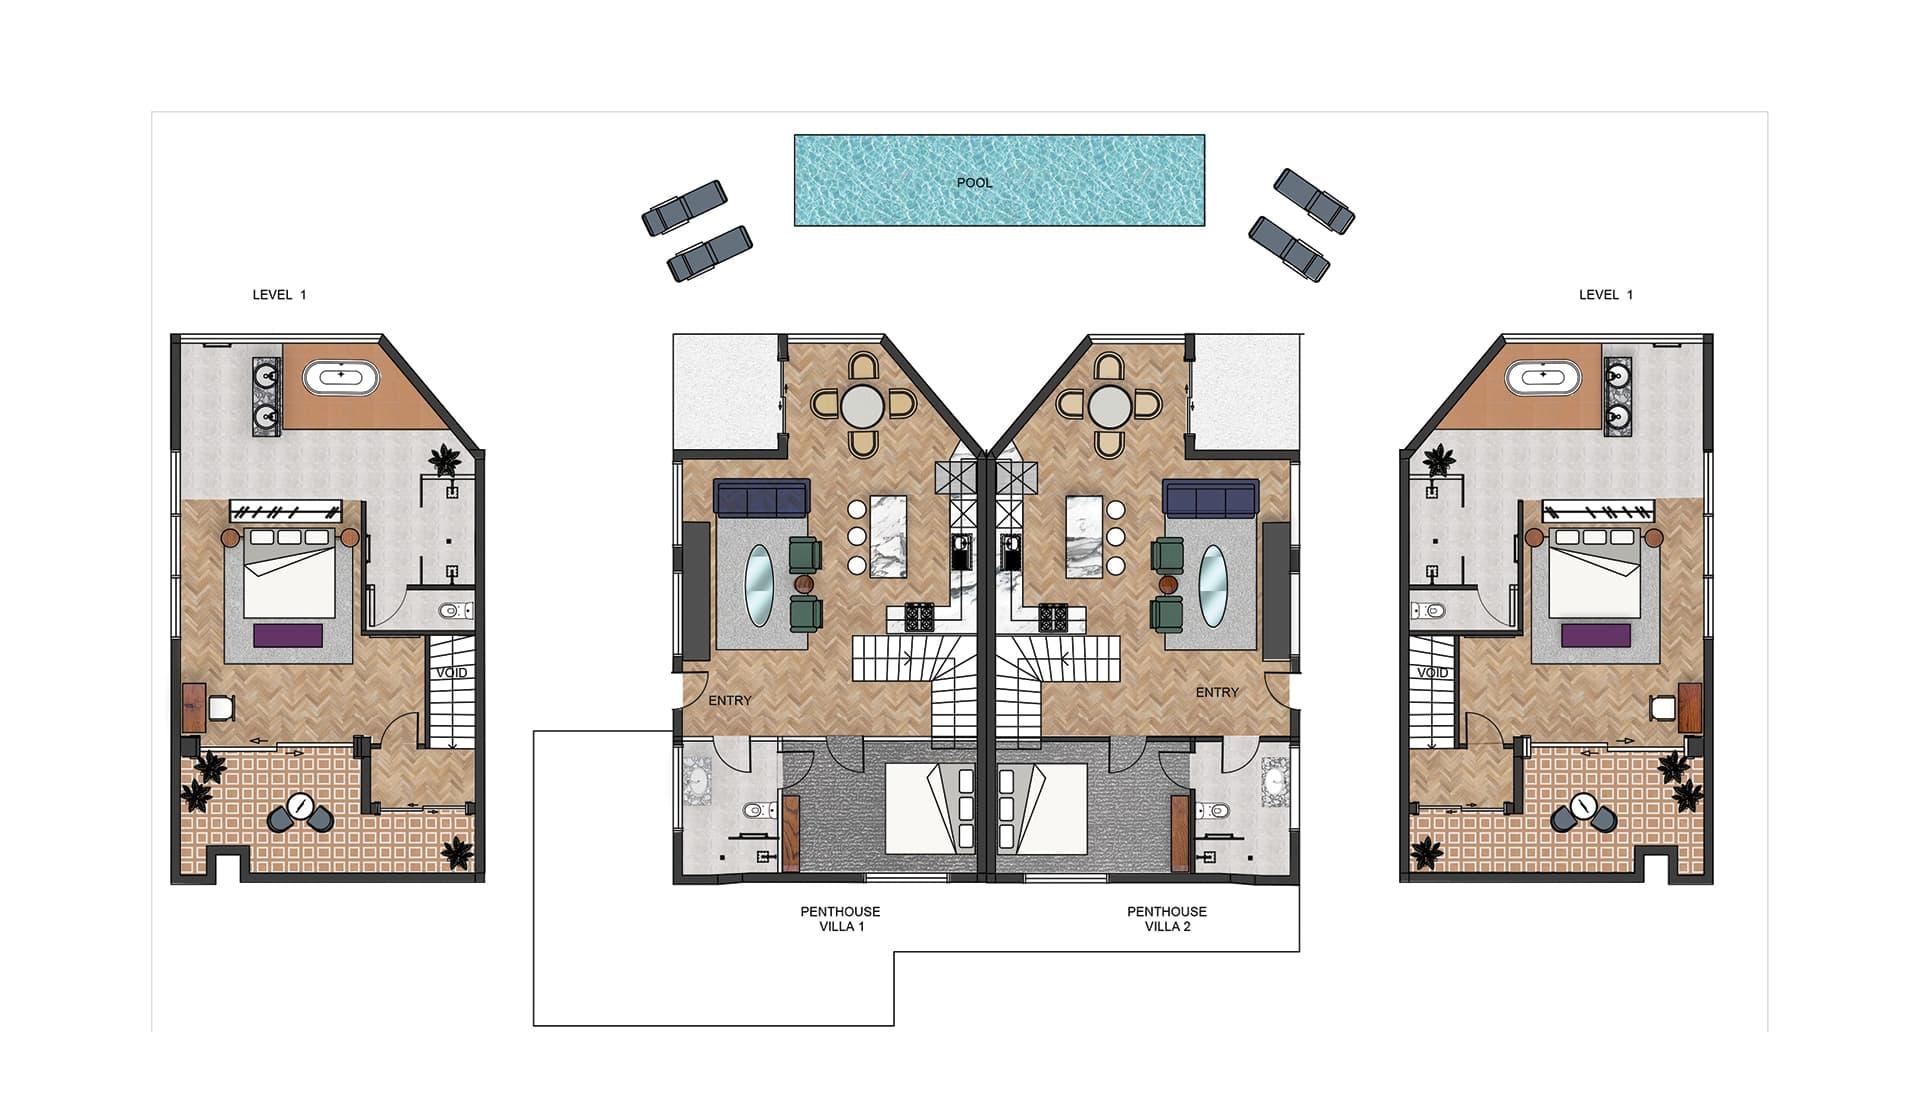 Penthouse floorplan_ copy